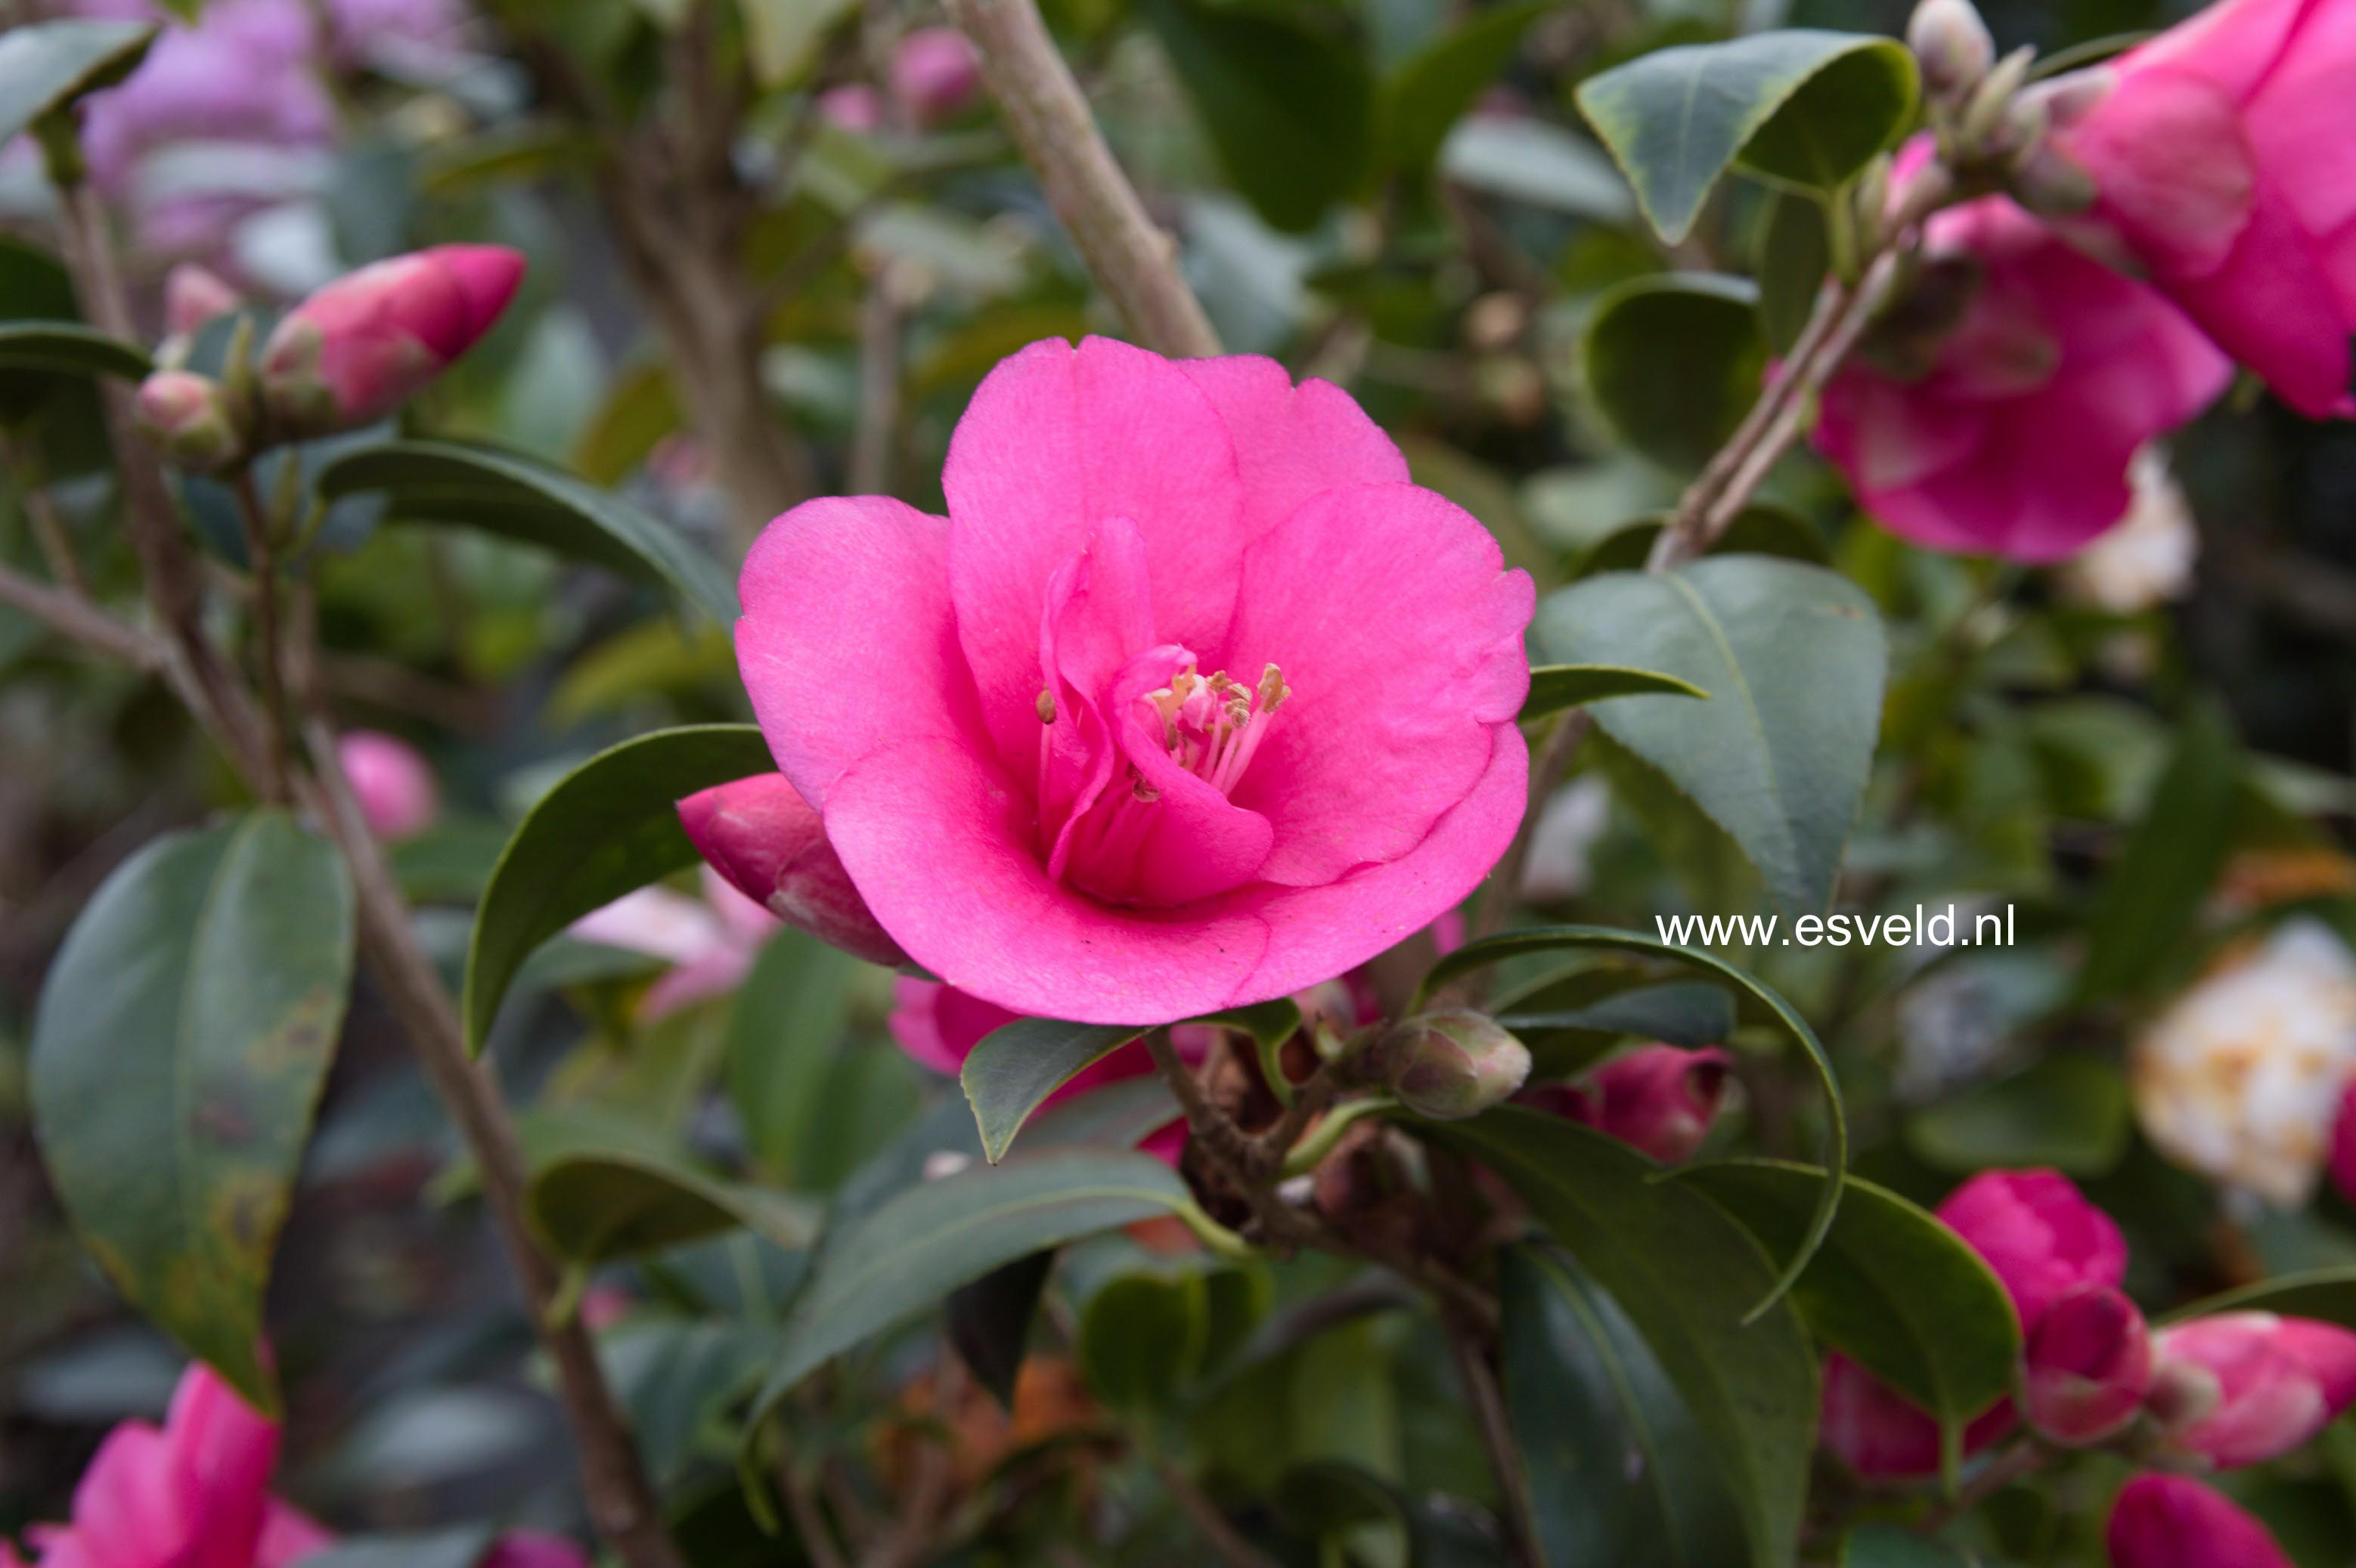 Camellia williamsii 'Gay Baby'